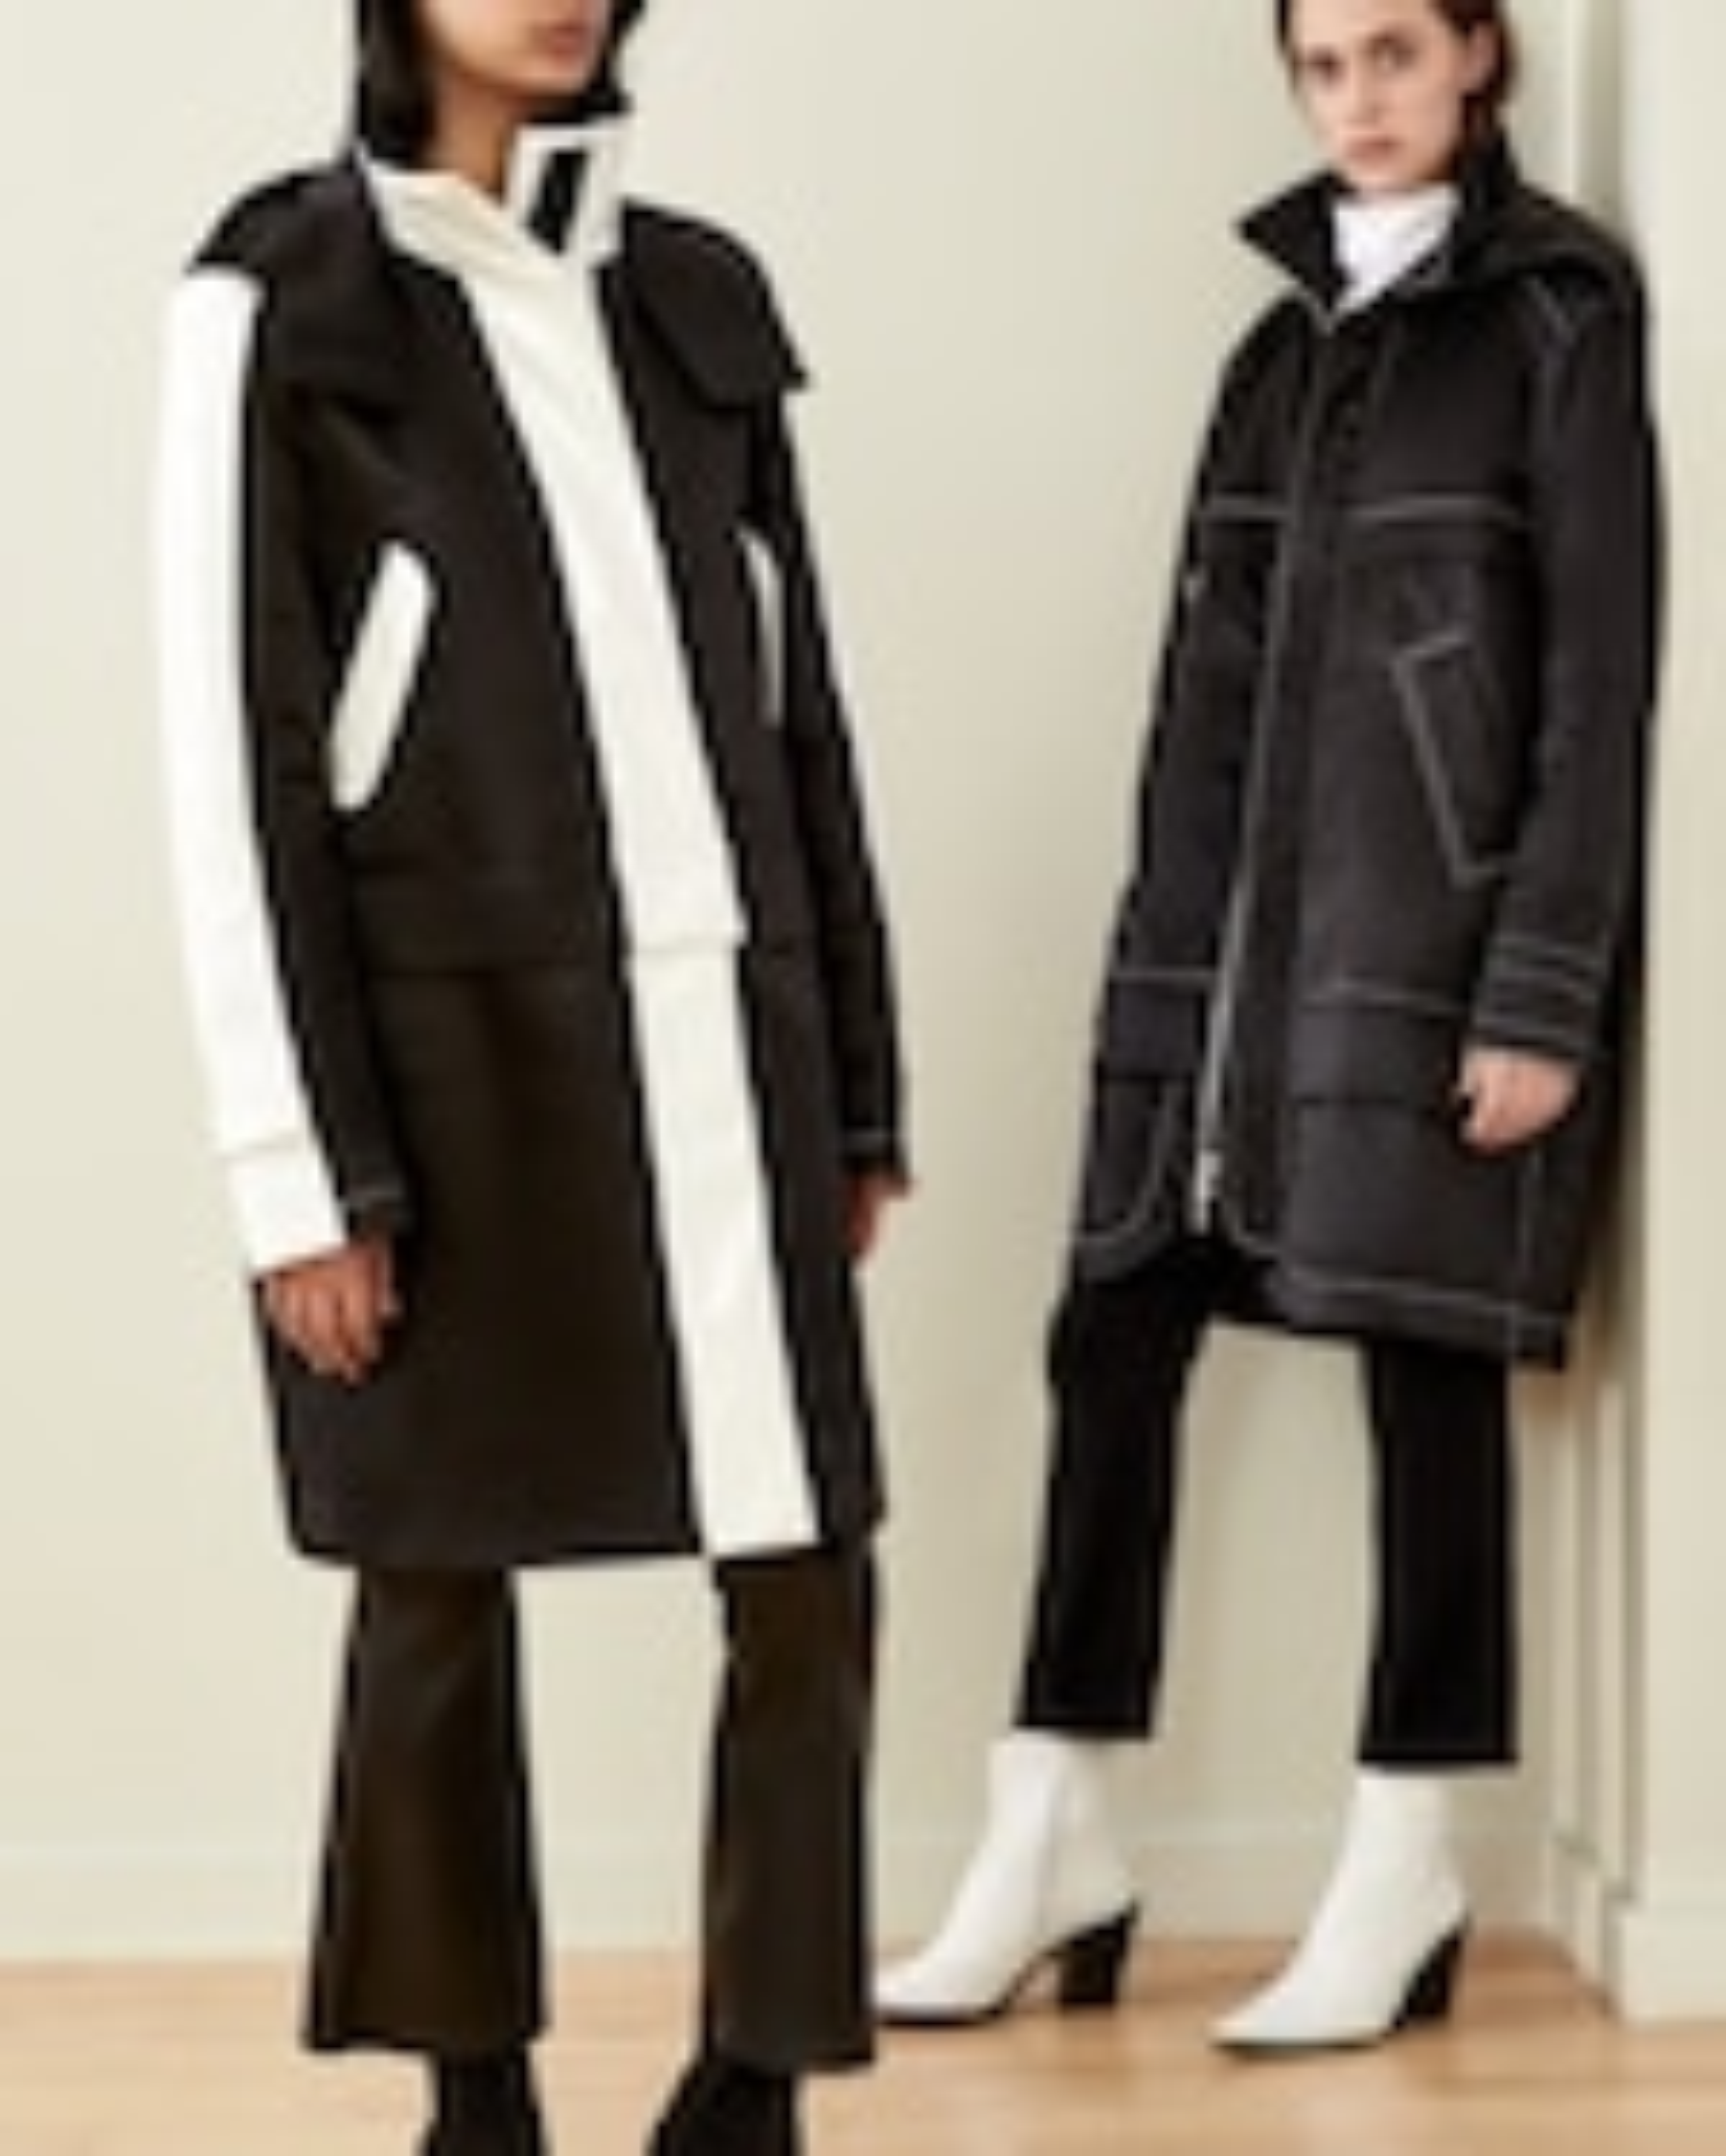 CAALO Convertible Sustainable Raincoat 1